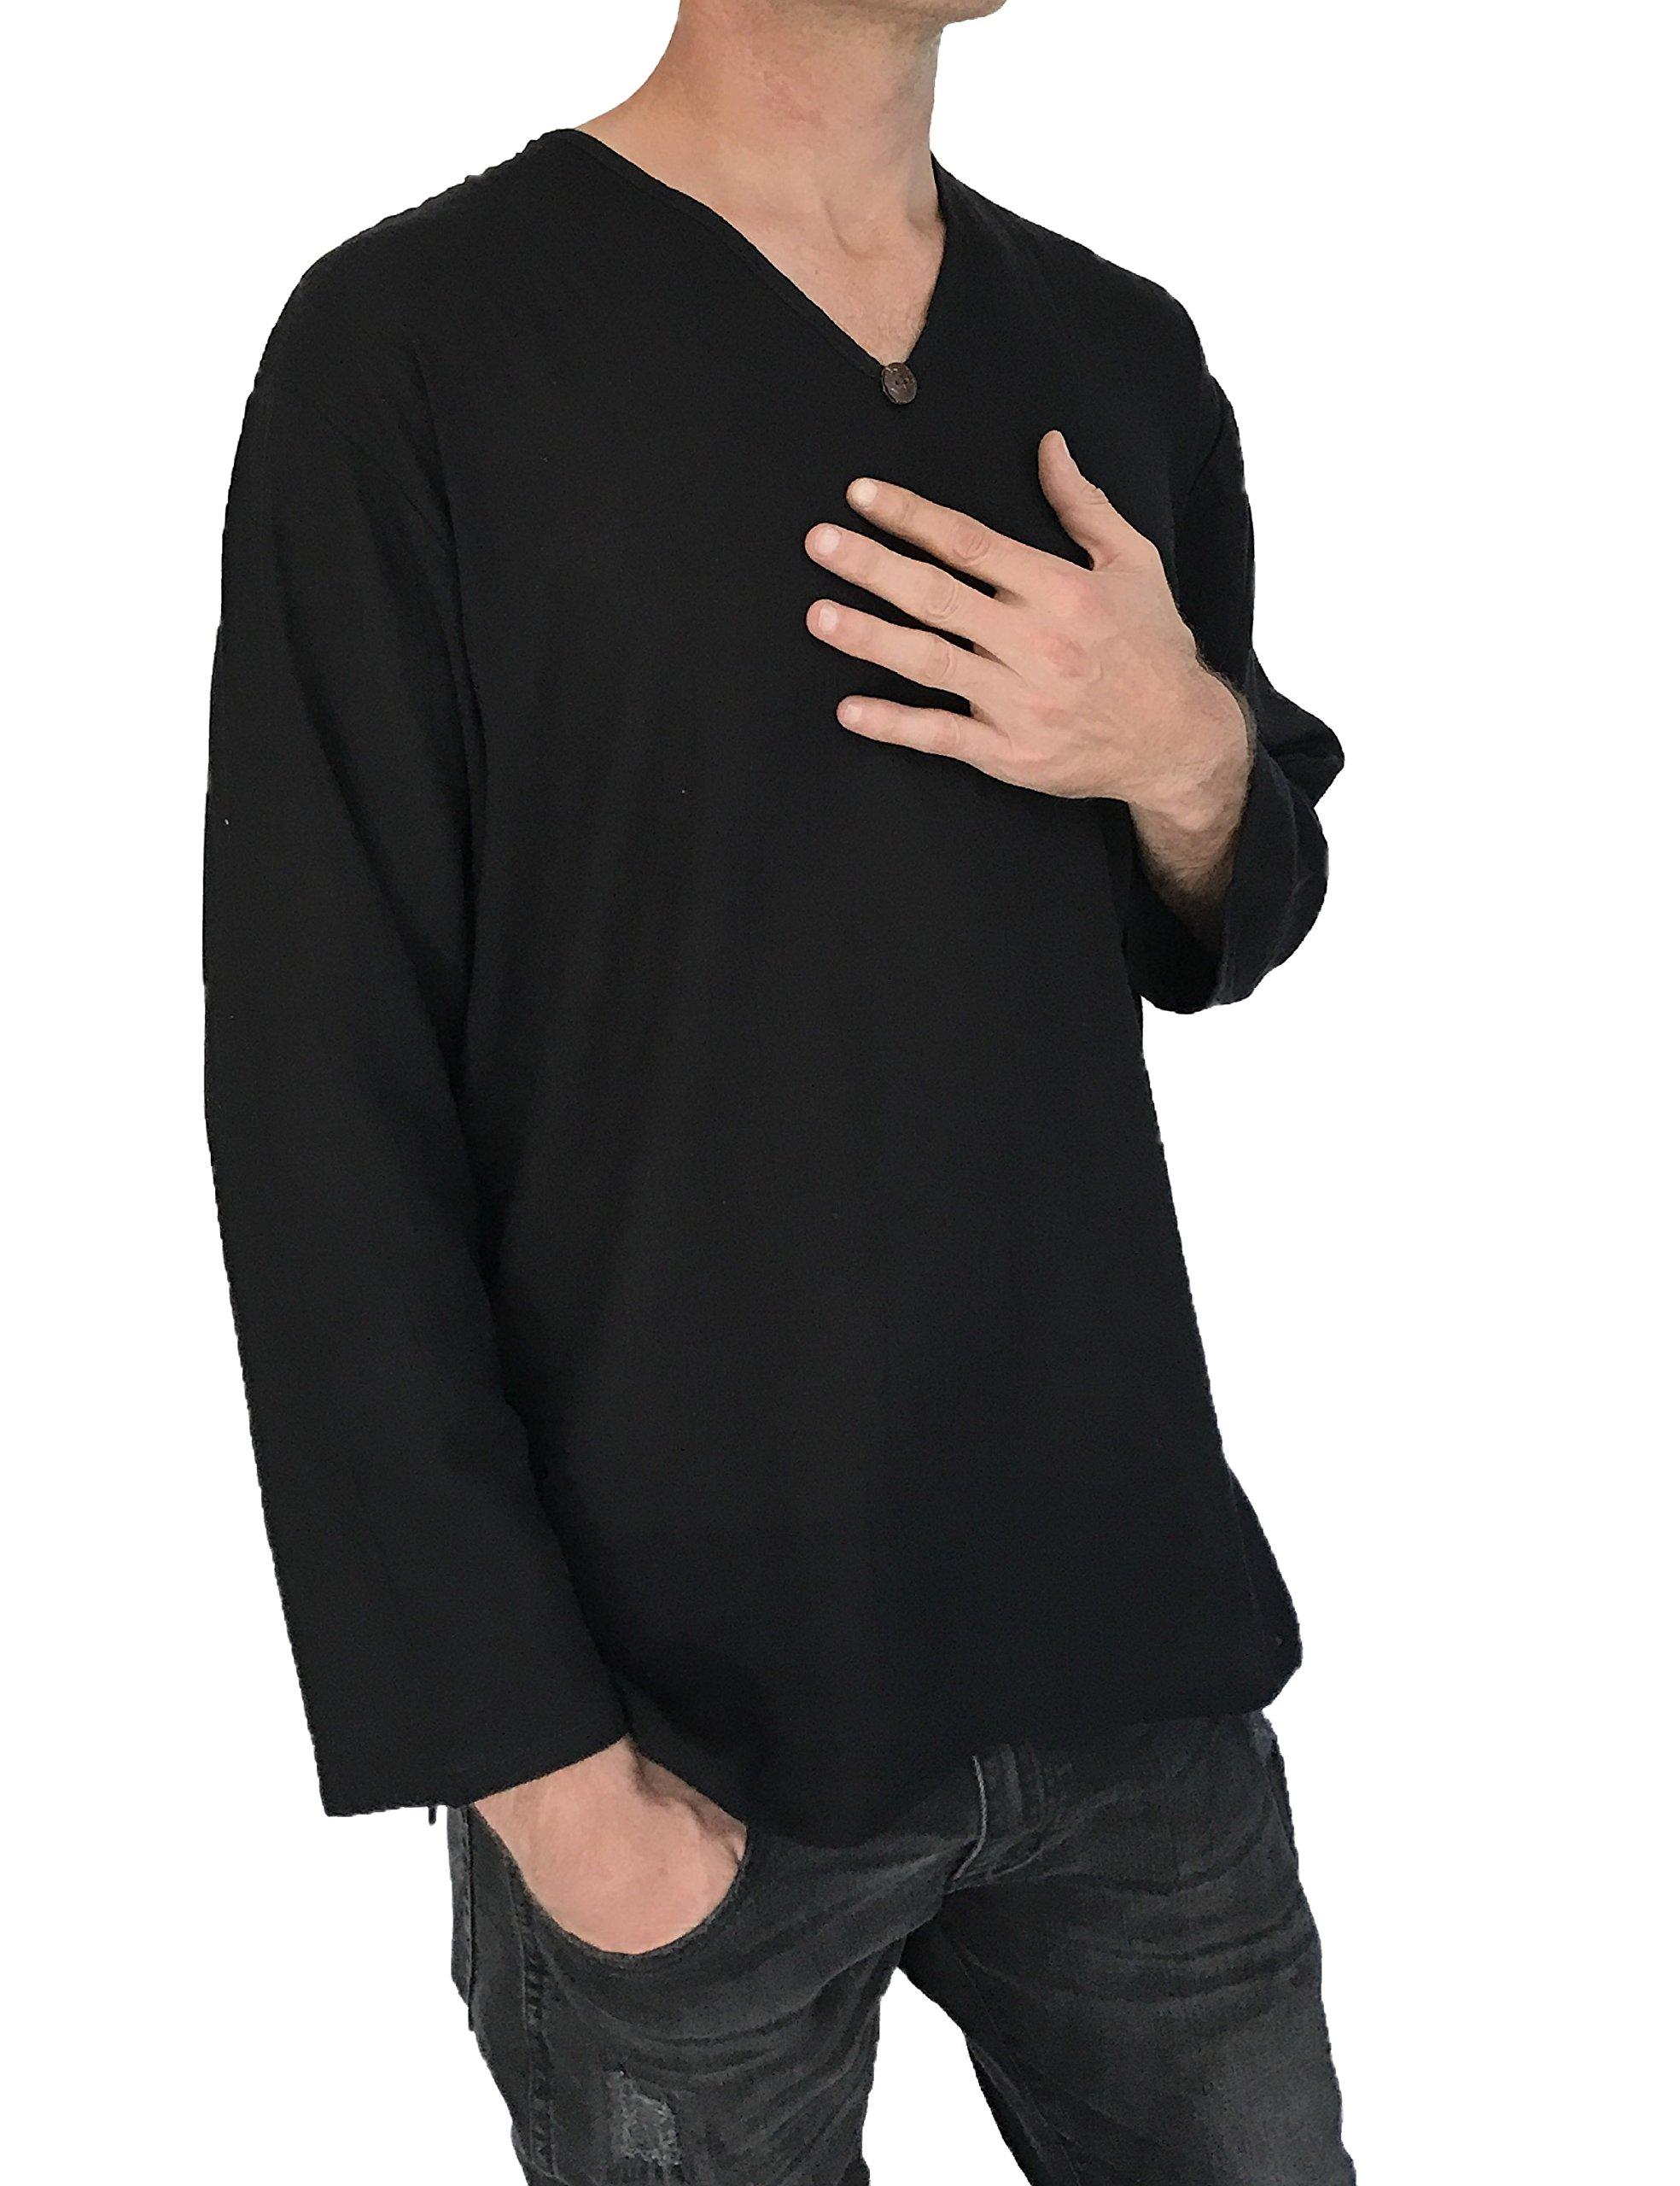 Love Quality Men's T-Shirt 100% Cotton Hippie Shirt Beach Yoga Top Feature Button (Medium, Black) by Love Quality (Image #3)